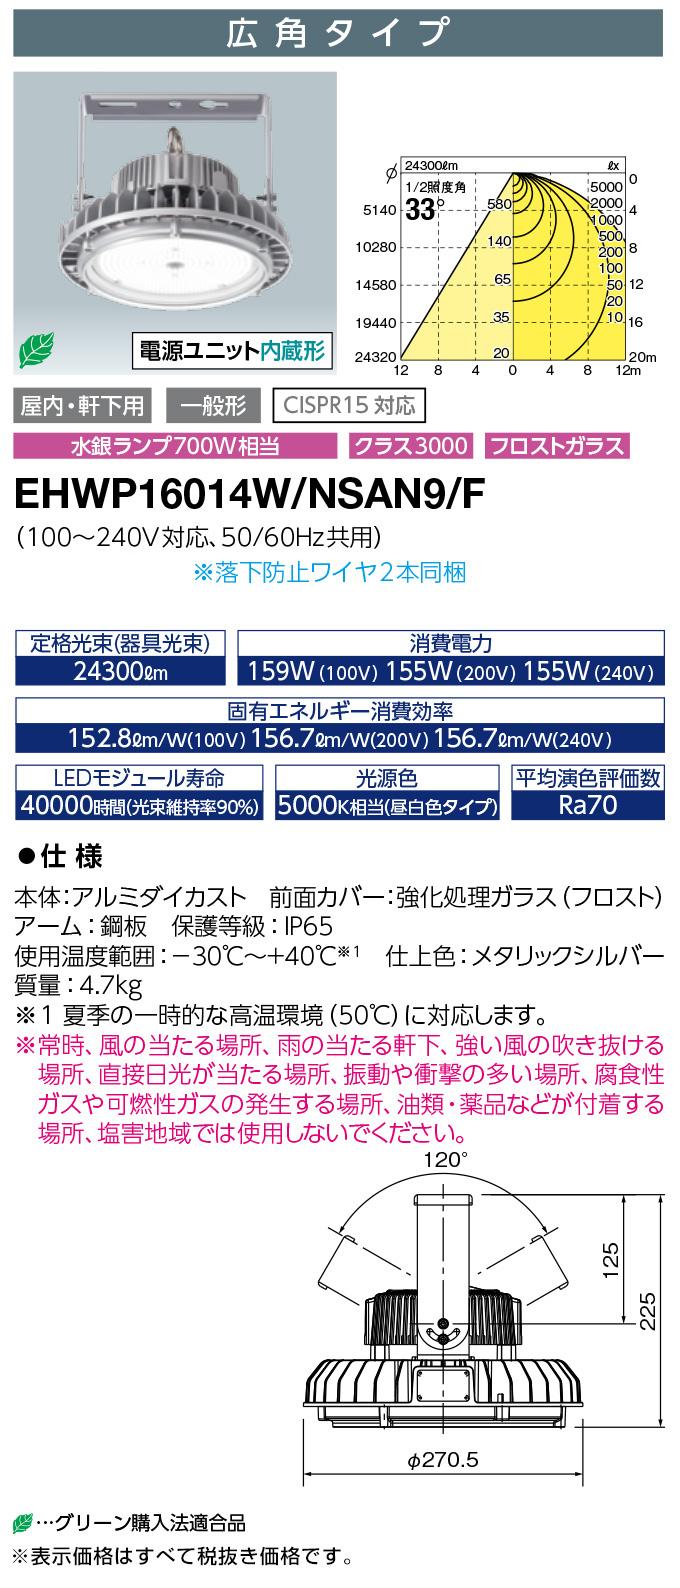 EHWP16014W/NSAN9/F